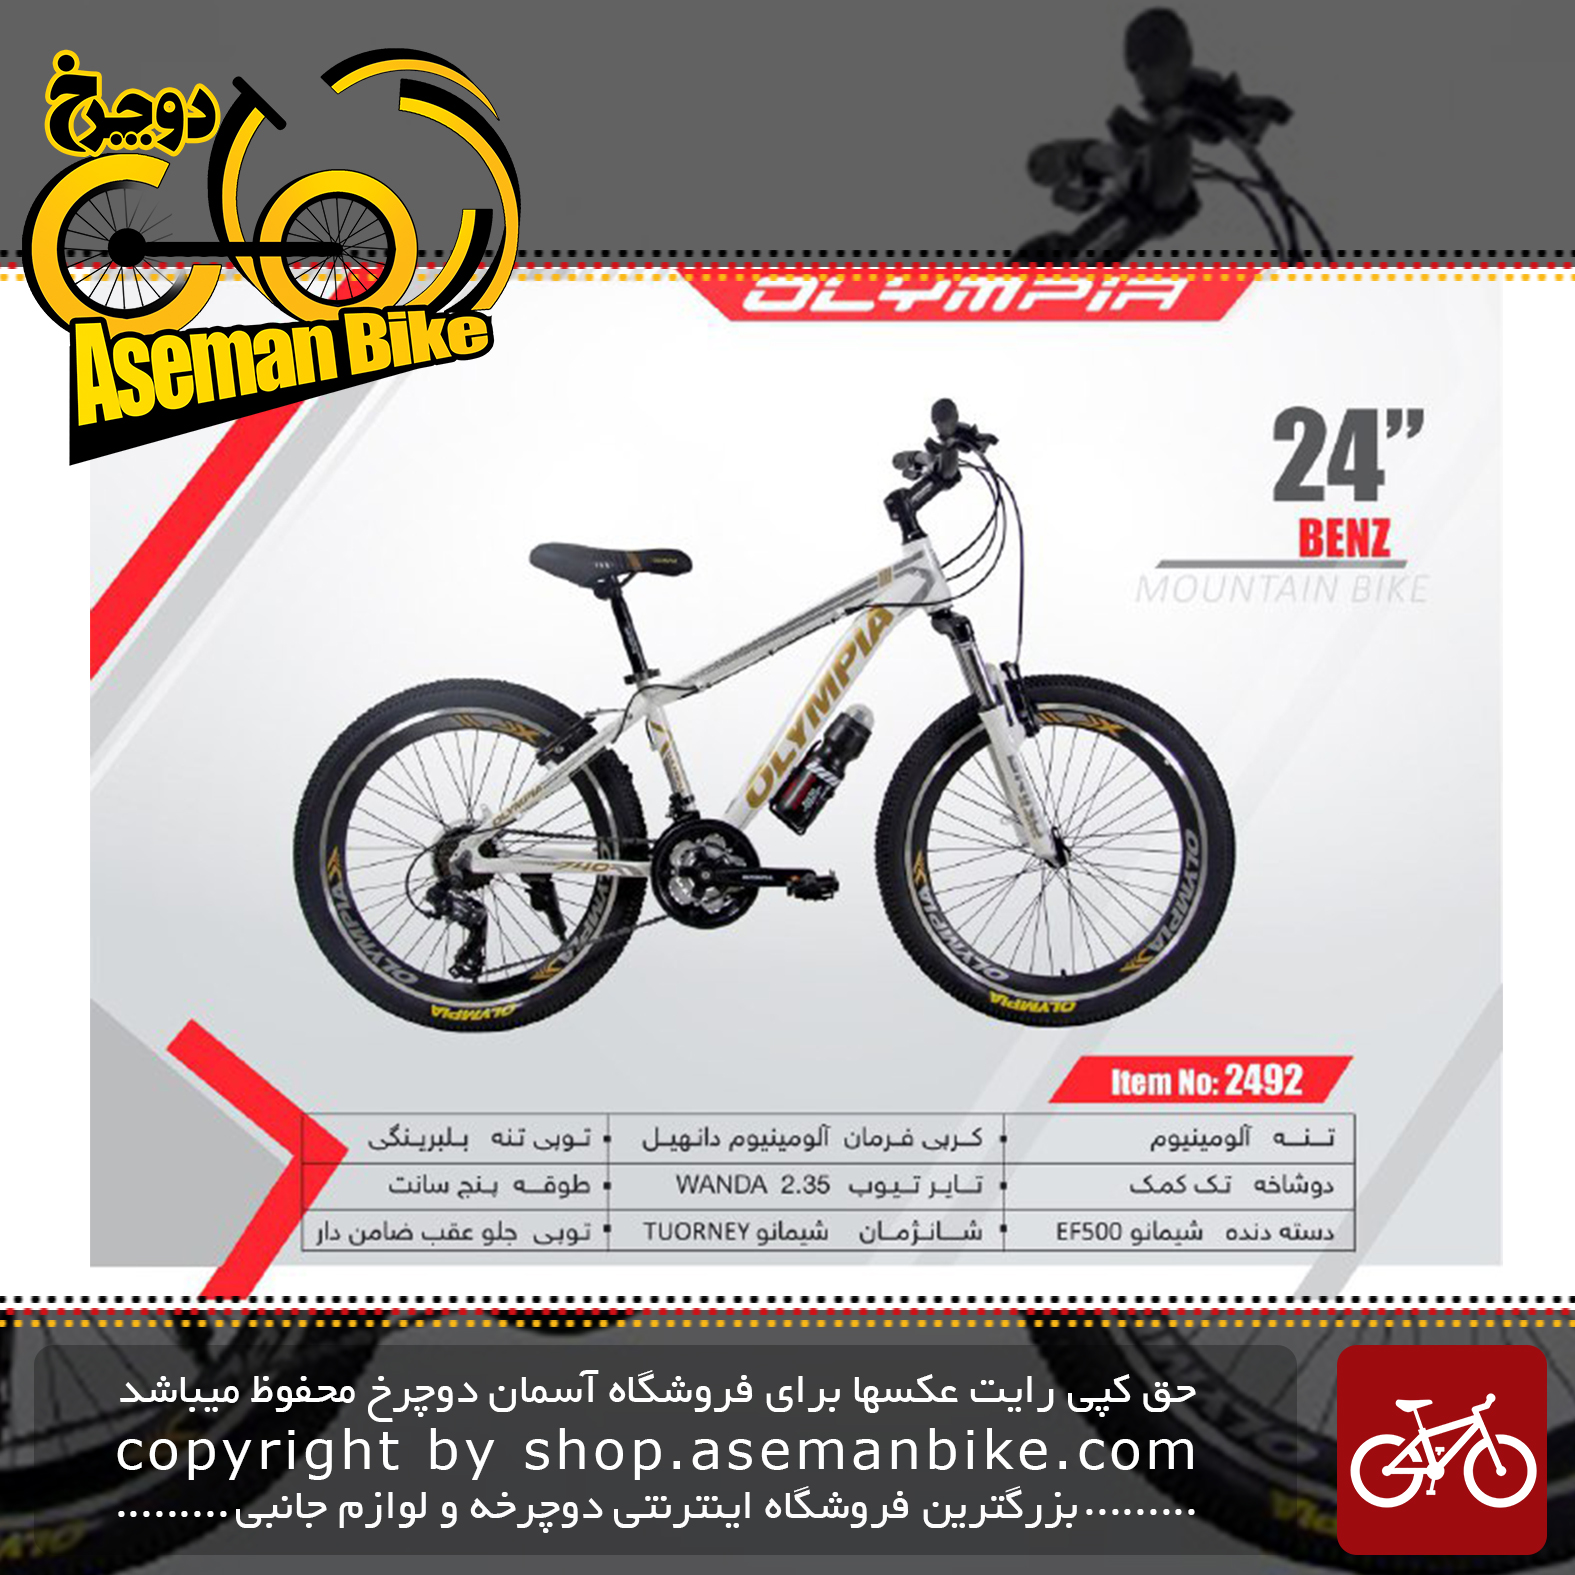 دوچرخه کوهستان المپیا سایز 24 مدل بنز OLYMPIA SIZE 24 BENZ